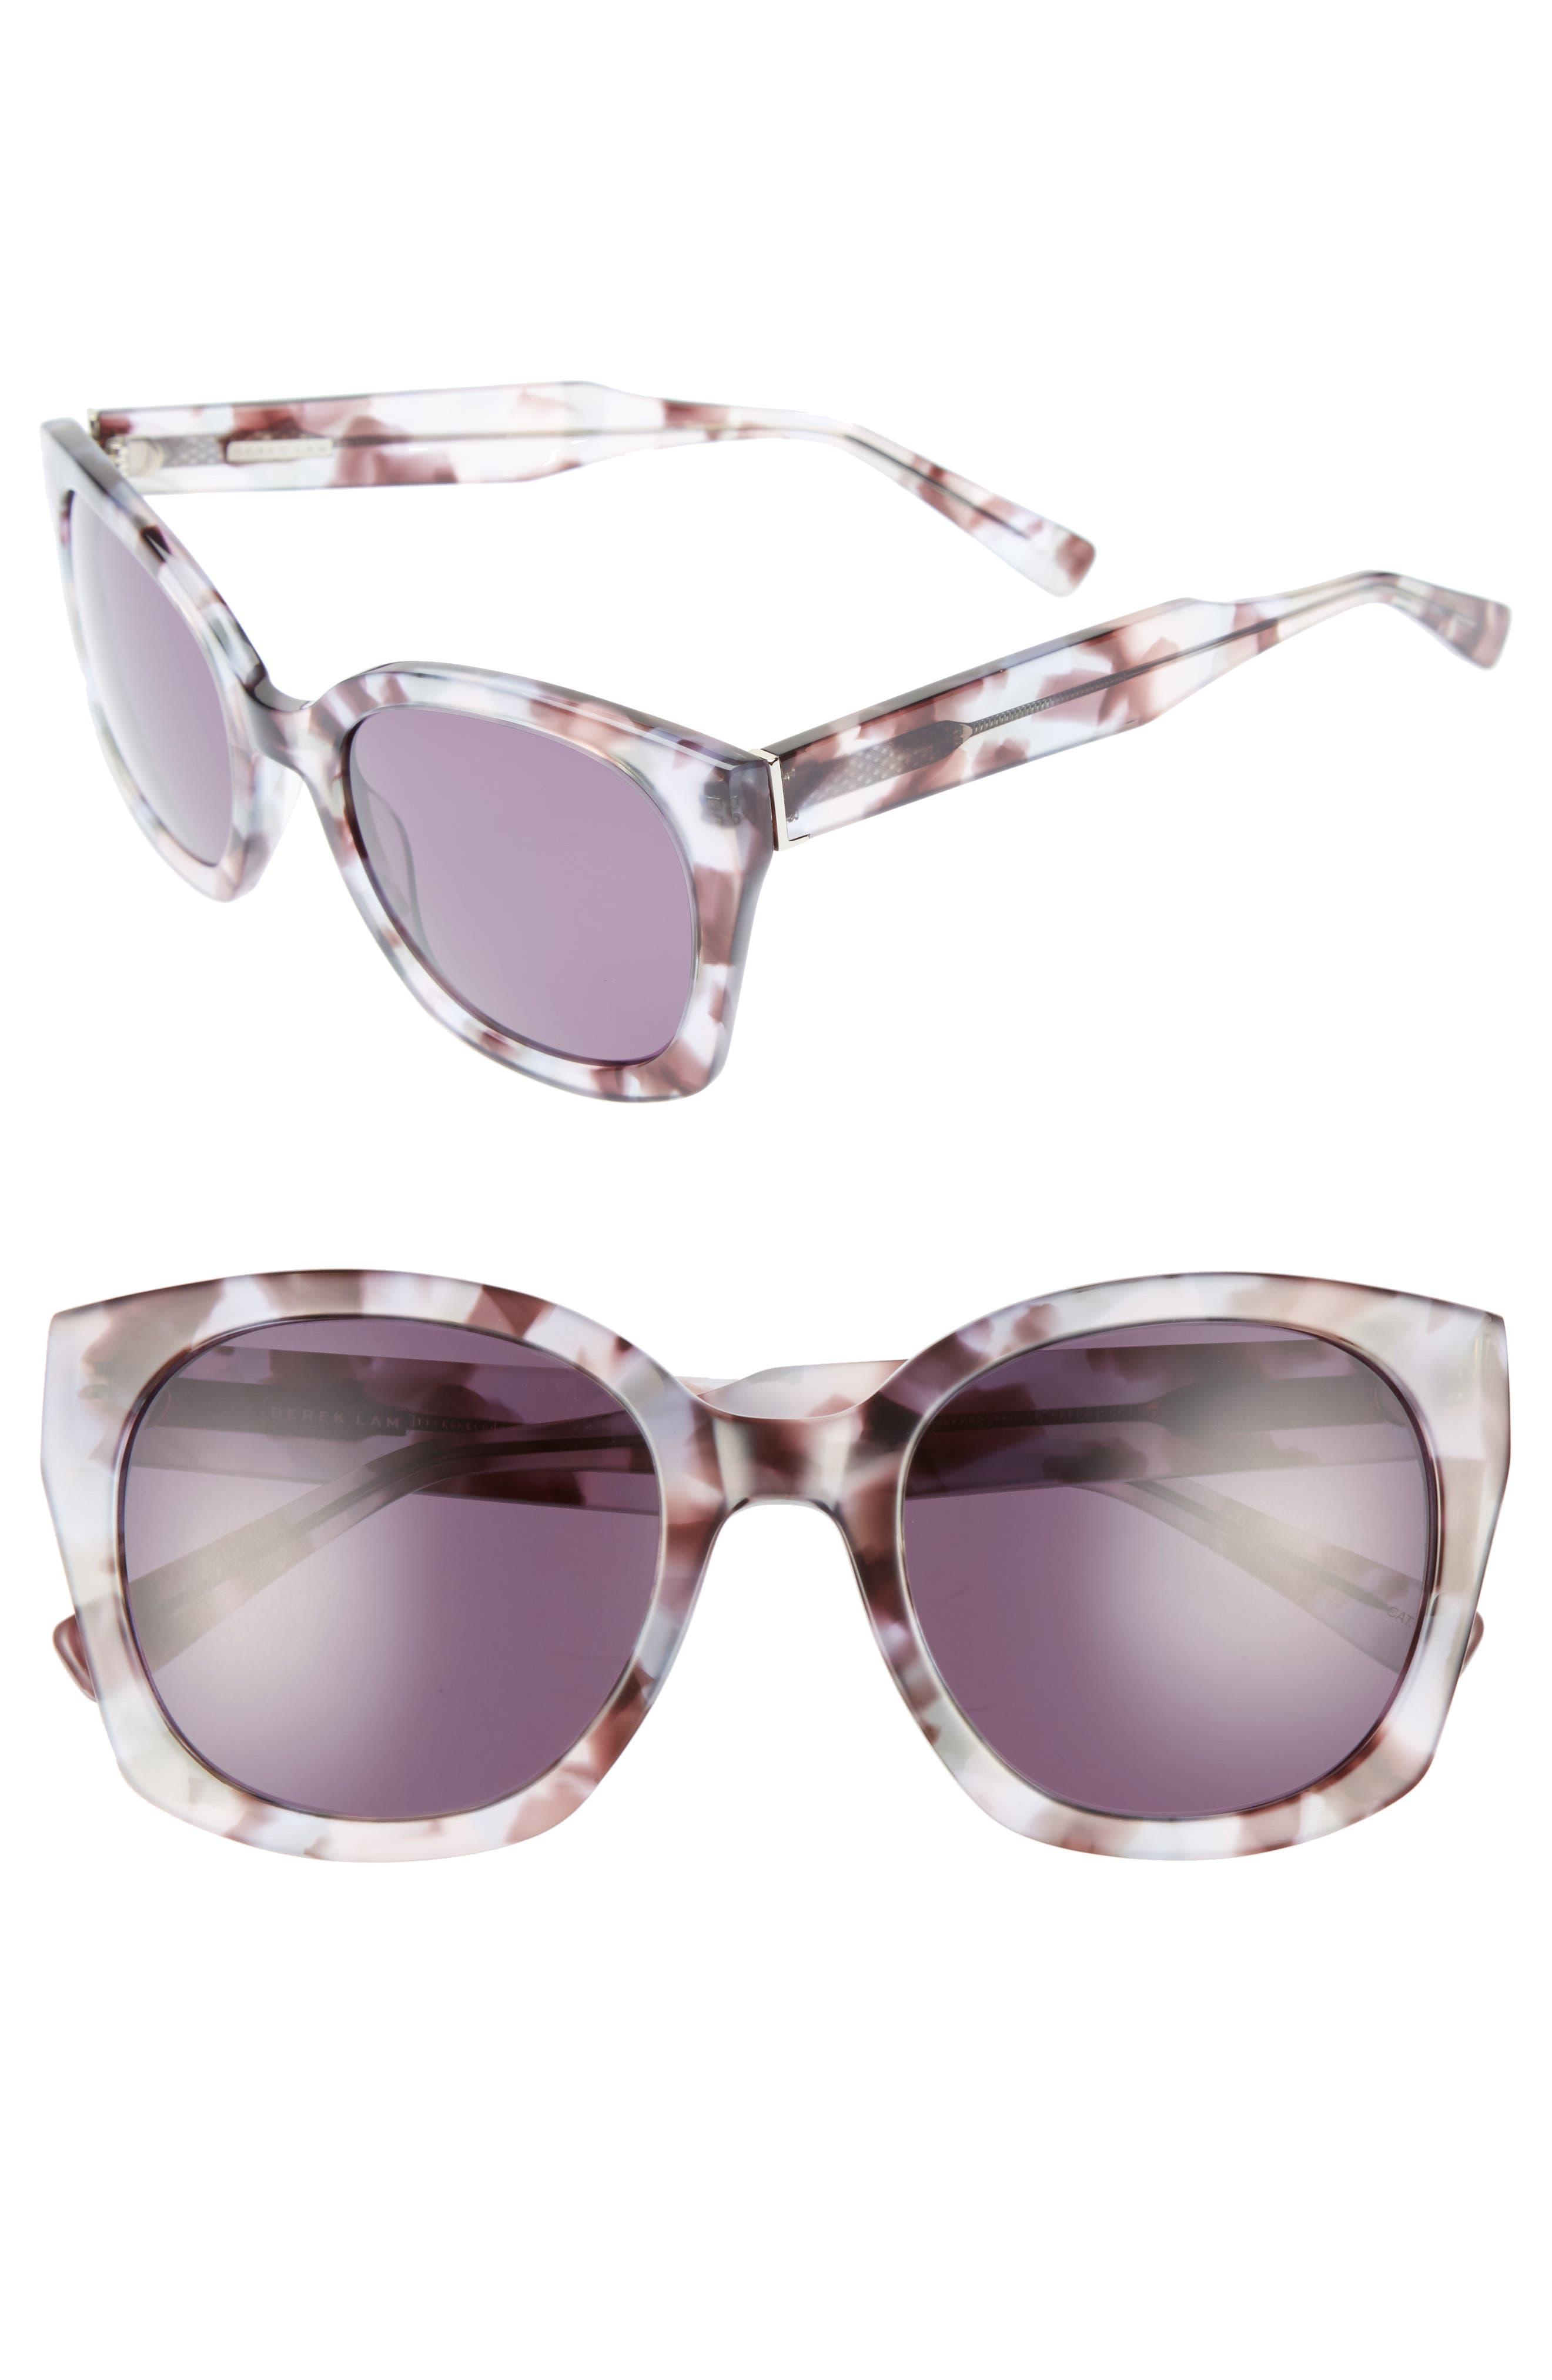 Derek Lam Sadie 54mm Sunglasses